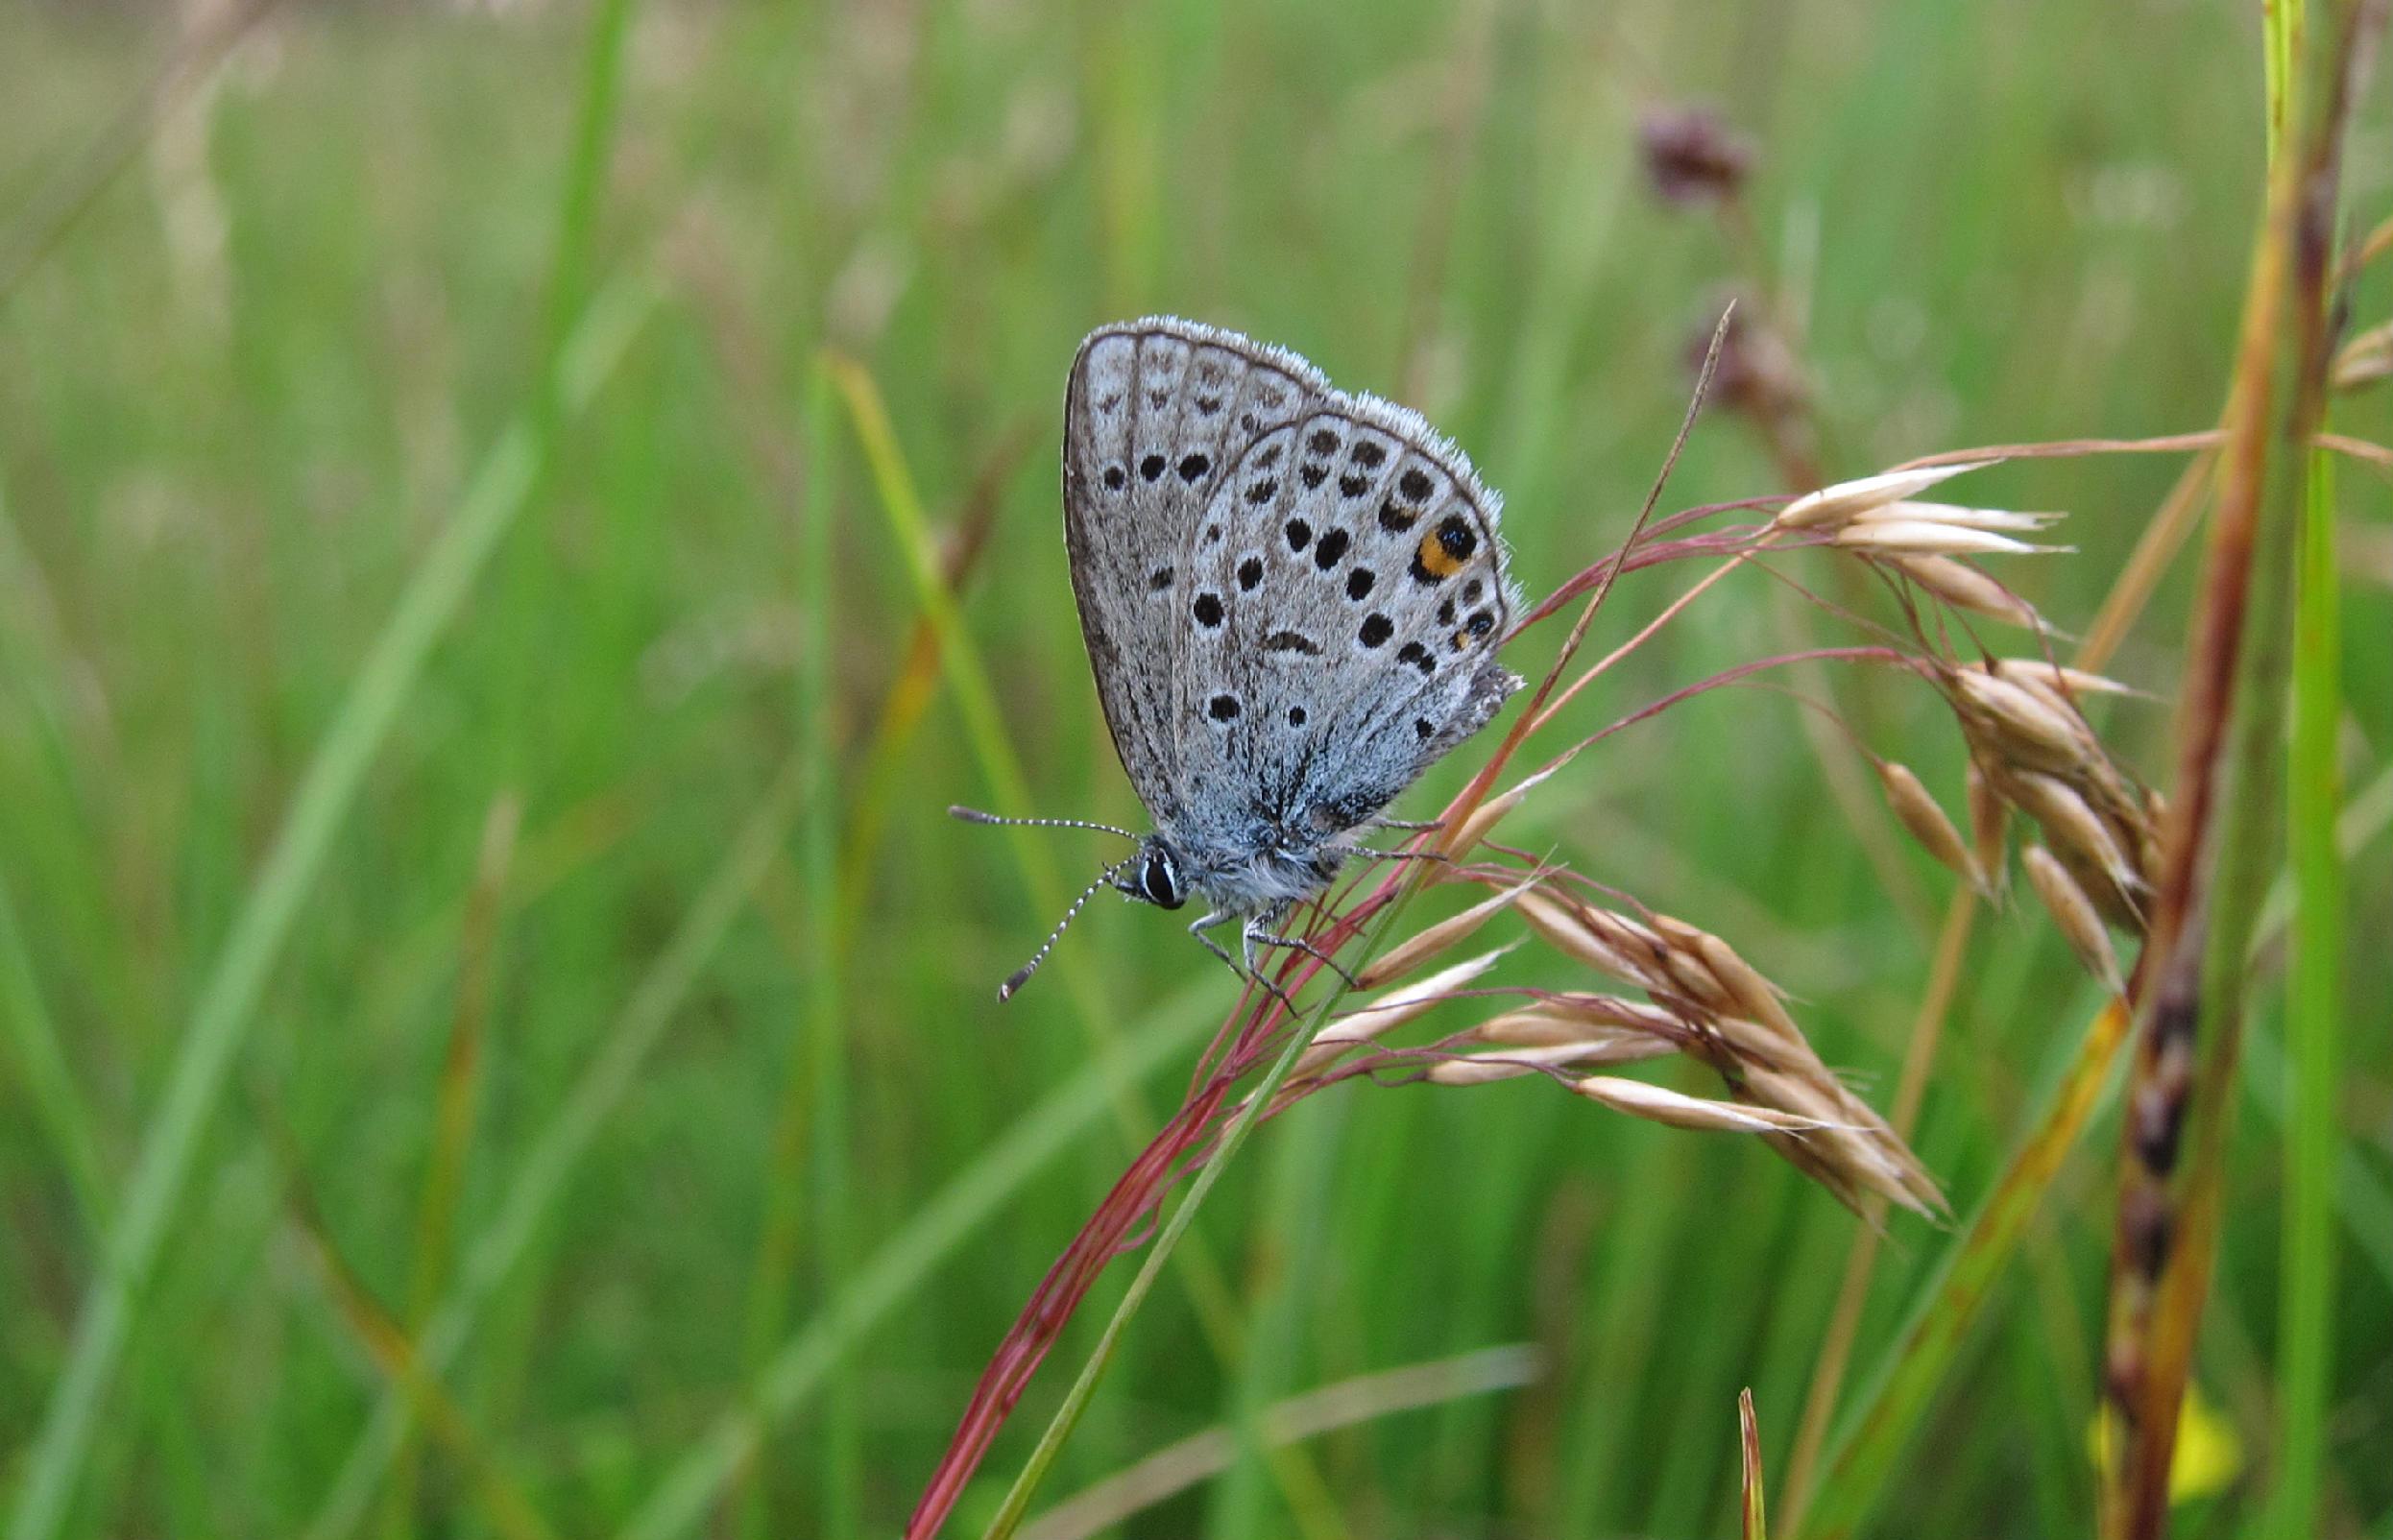 Ny optælling: Danske sommerfugle dør i massevis